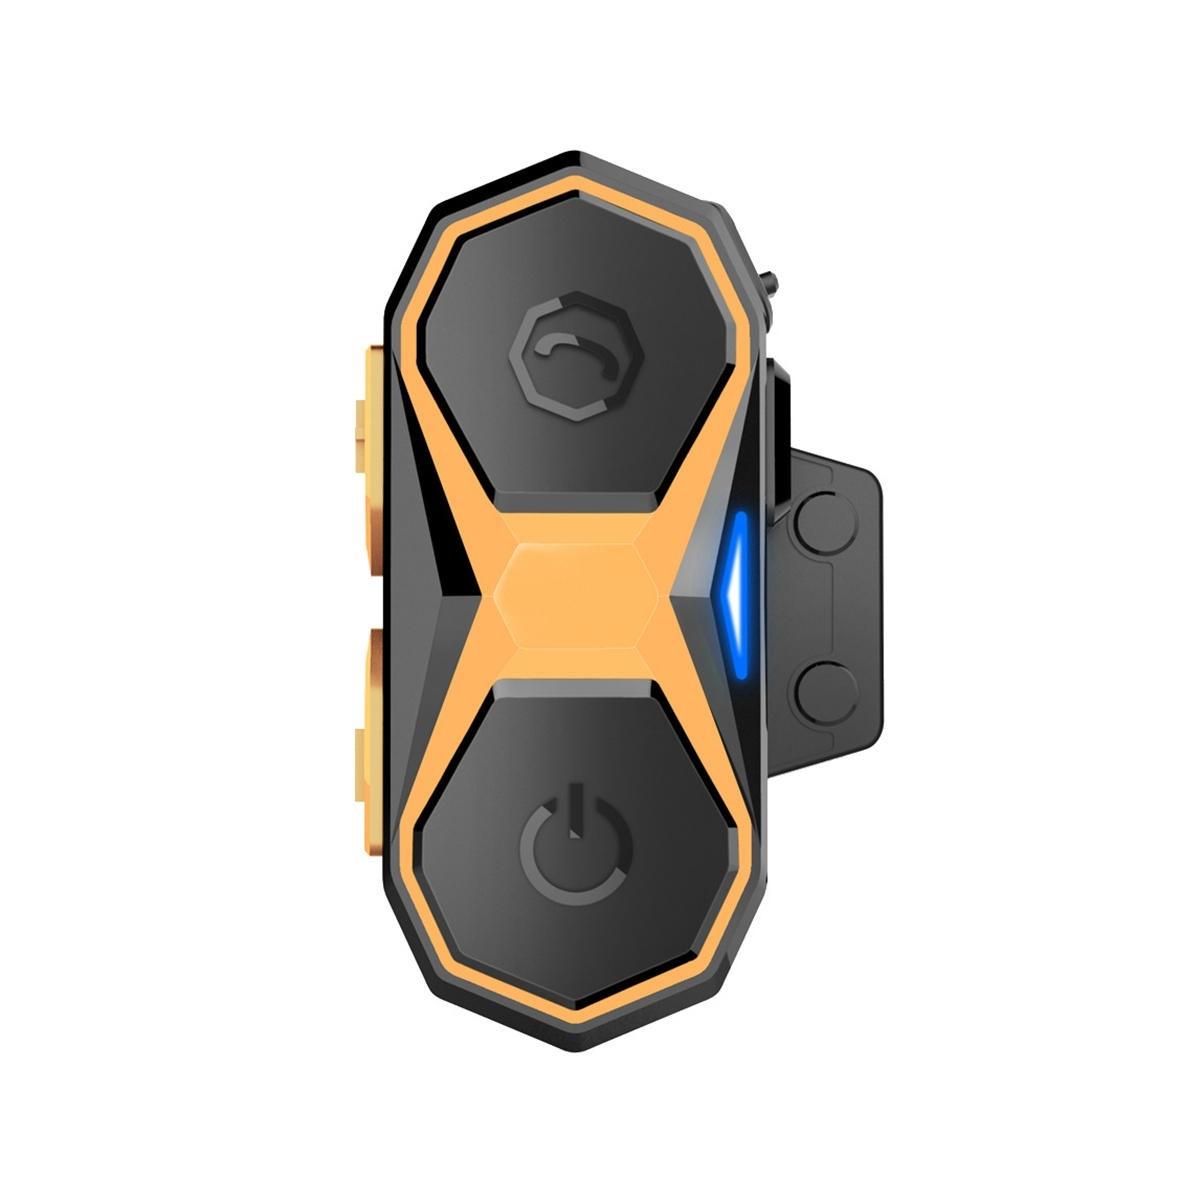 WT005 Motorcykelhjälm Interphone Intercom bluetooth3.0 1000M 2,4 GHz